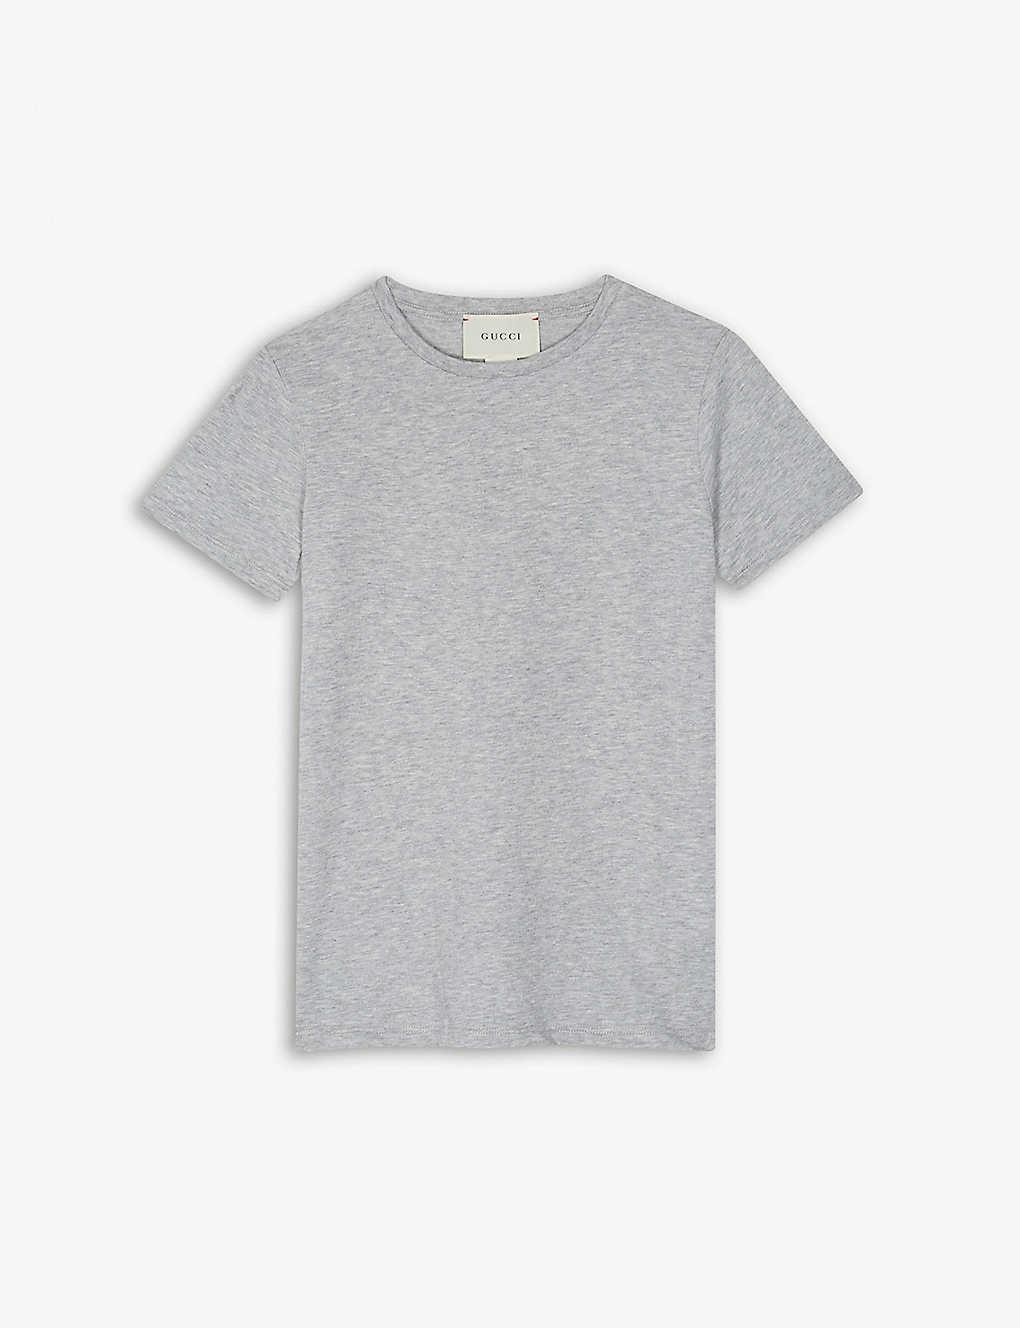 063604bf4f9d GUCCI - U.F.O. printed cotton T-shirt 4-12 years | Selfridges.com